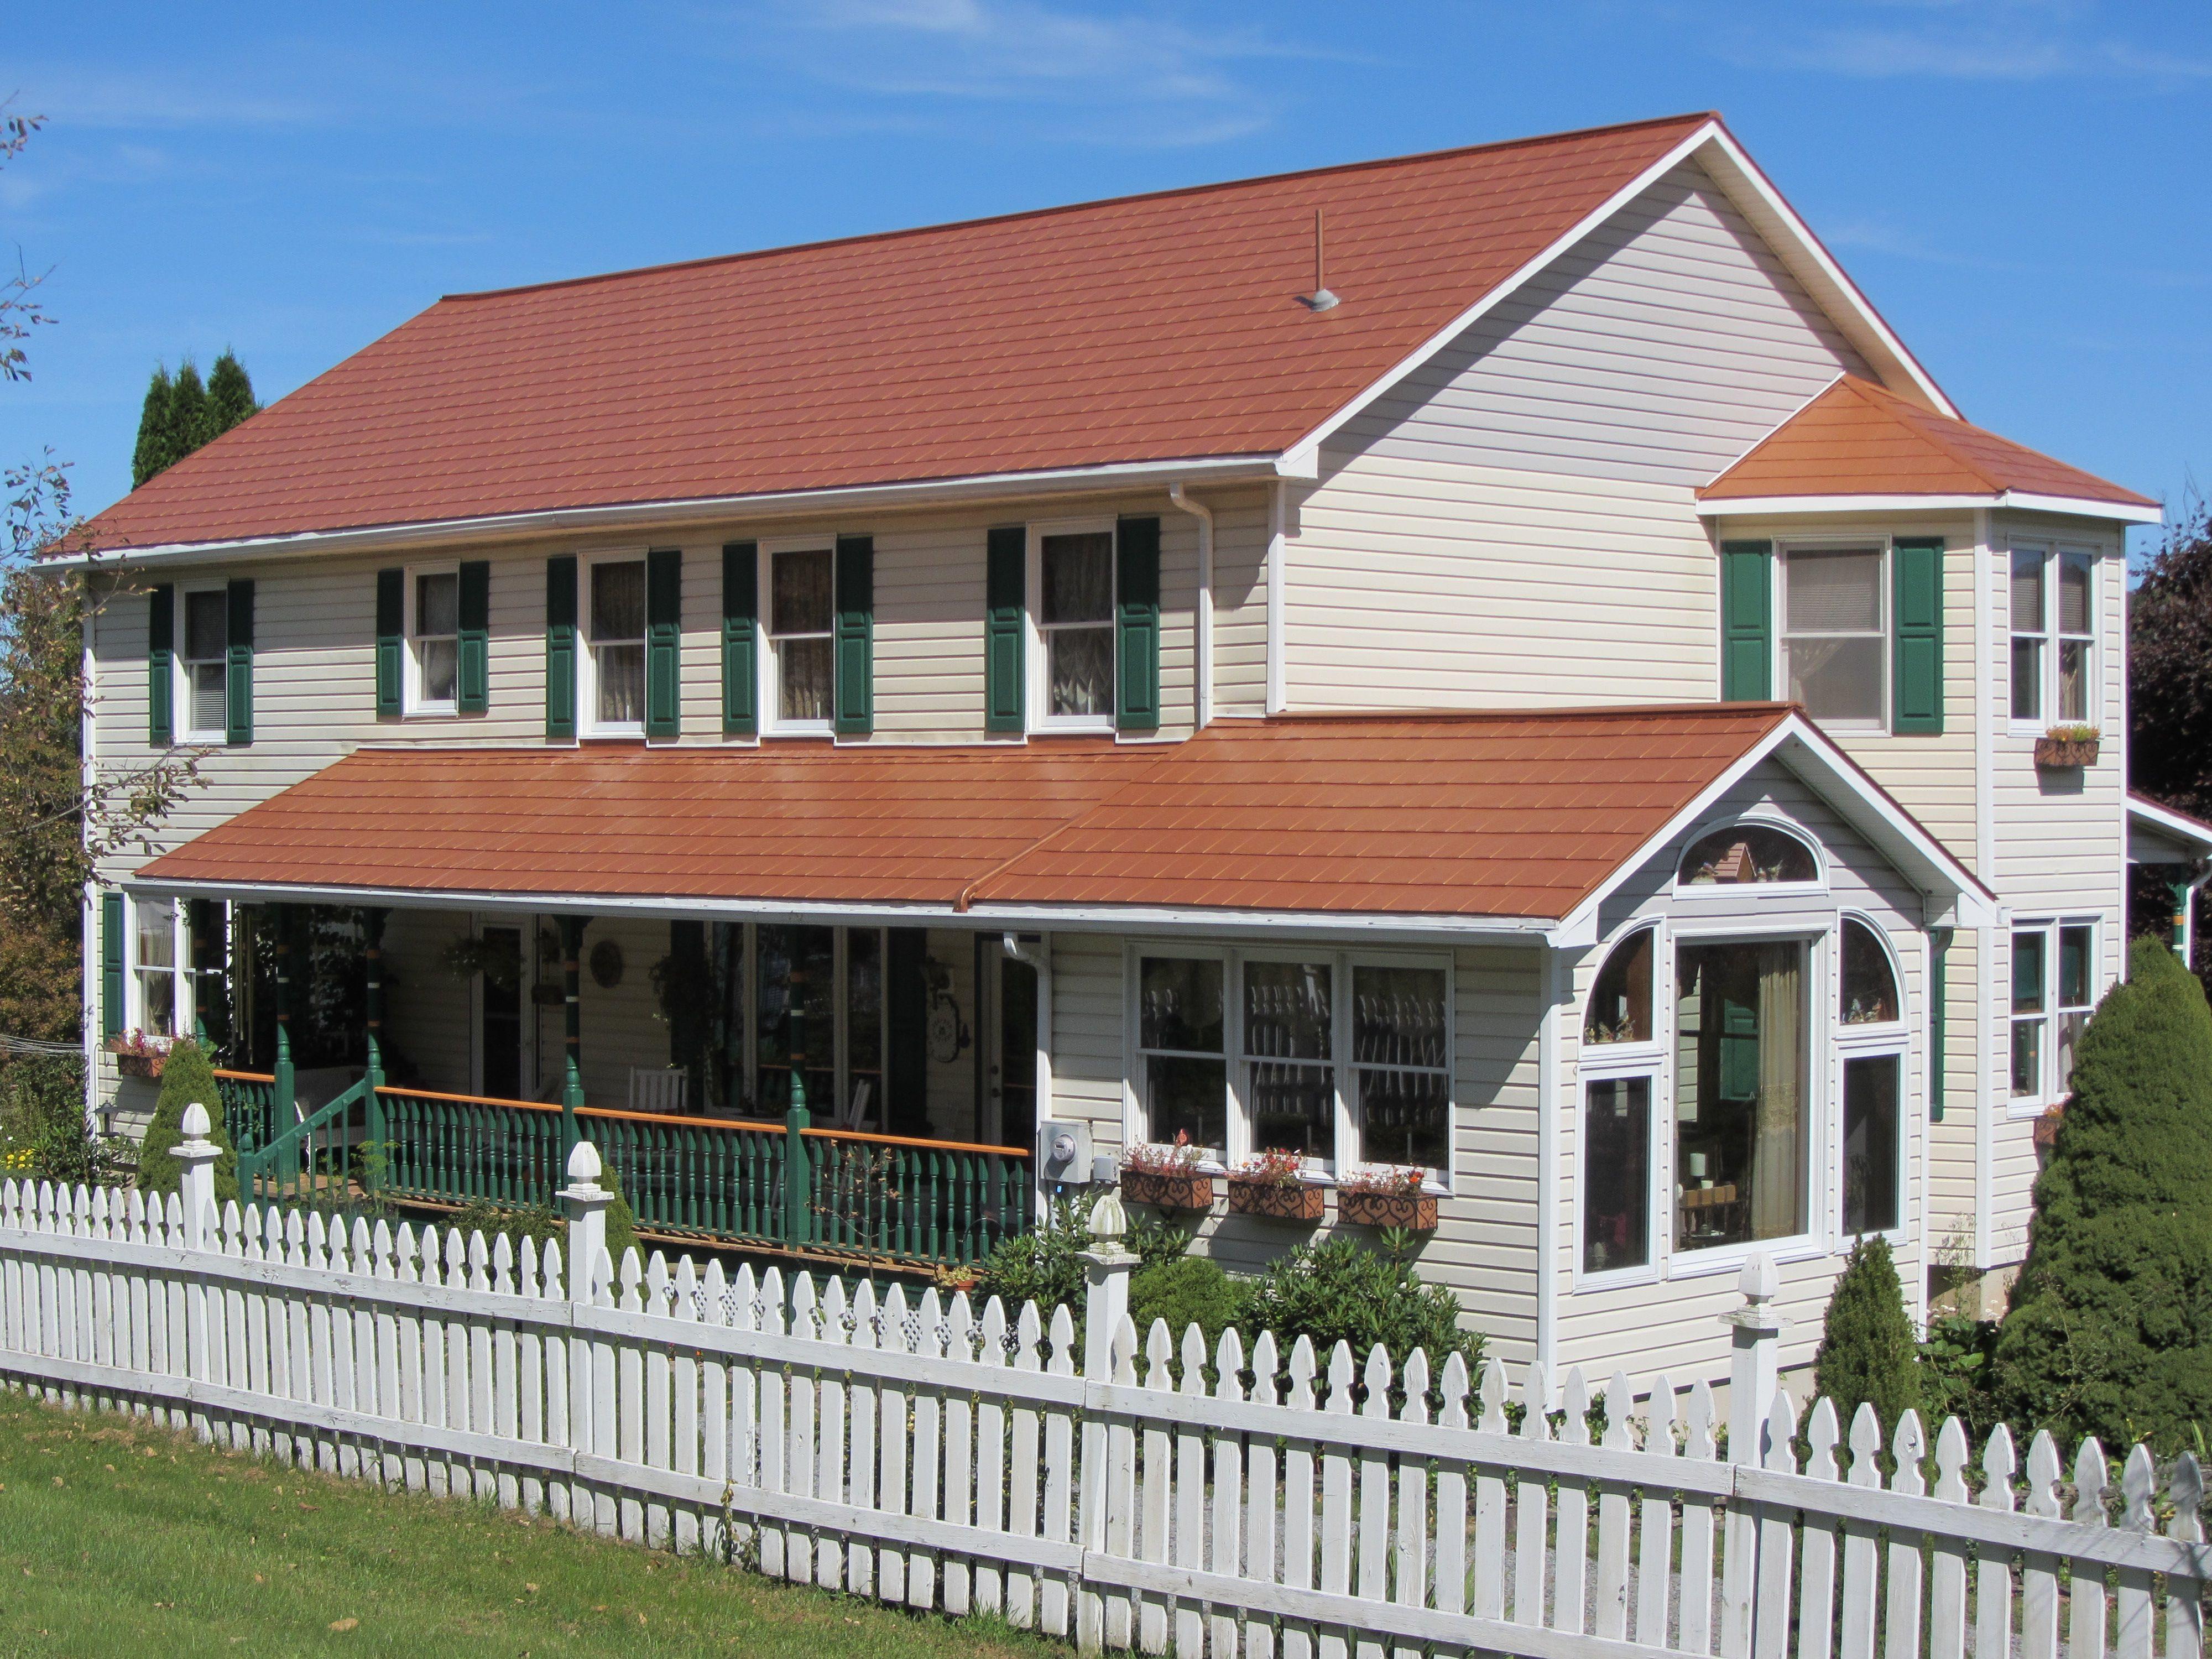 Metal Roofing Steel Roofing Visit Http Www Wakefieldbridge Com Metalroofing Roof Architecture Modern Roofing Roof Design